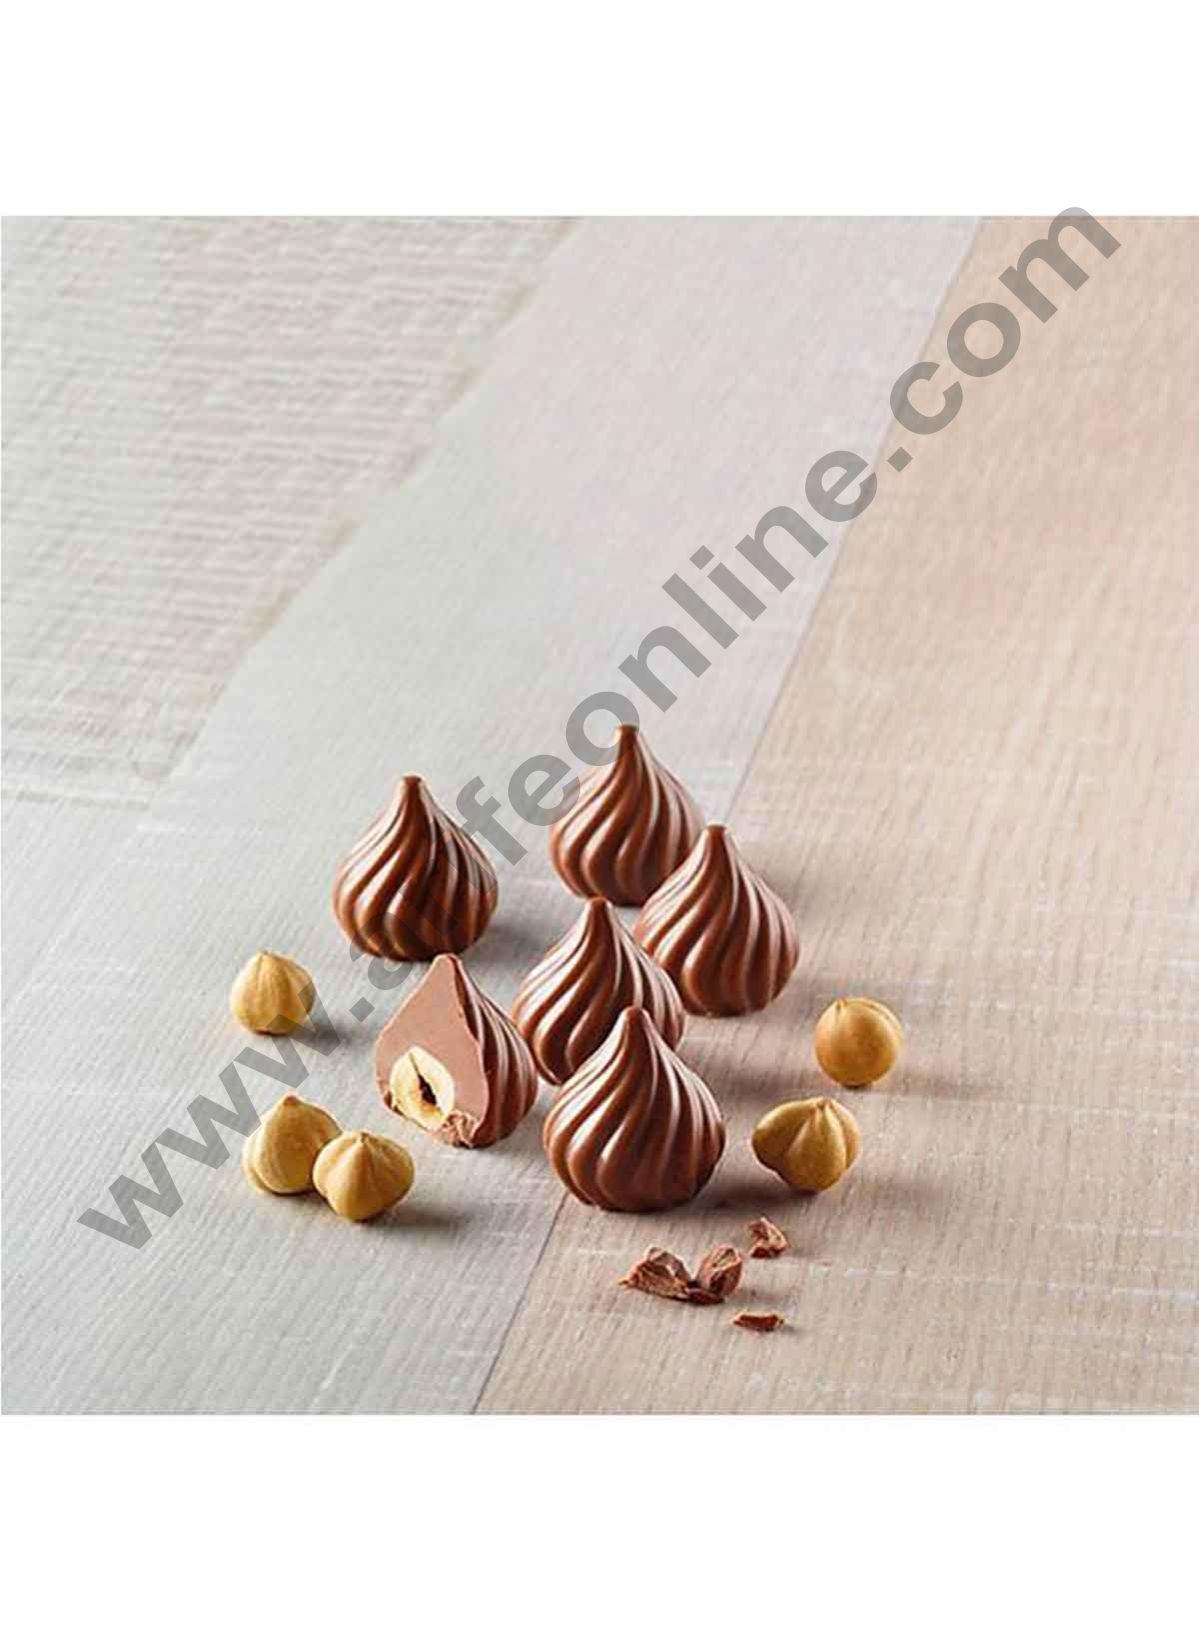 Cake Decor New Mini Modak Shape 15 Cavity Chocolate Mould, Silicone Molds for Chocolate, Chocolate Silicone Moulds, Silicon Brown Chocolate Moulds for Ganesh Chaturti Festivals